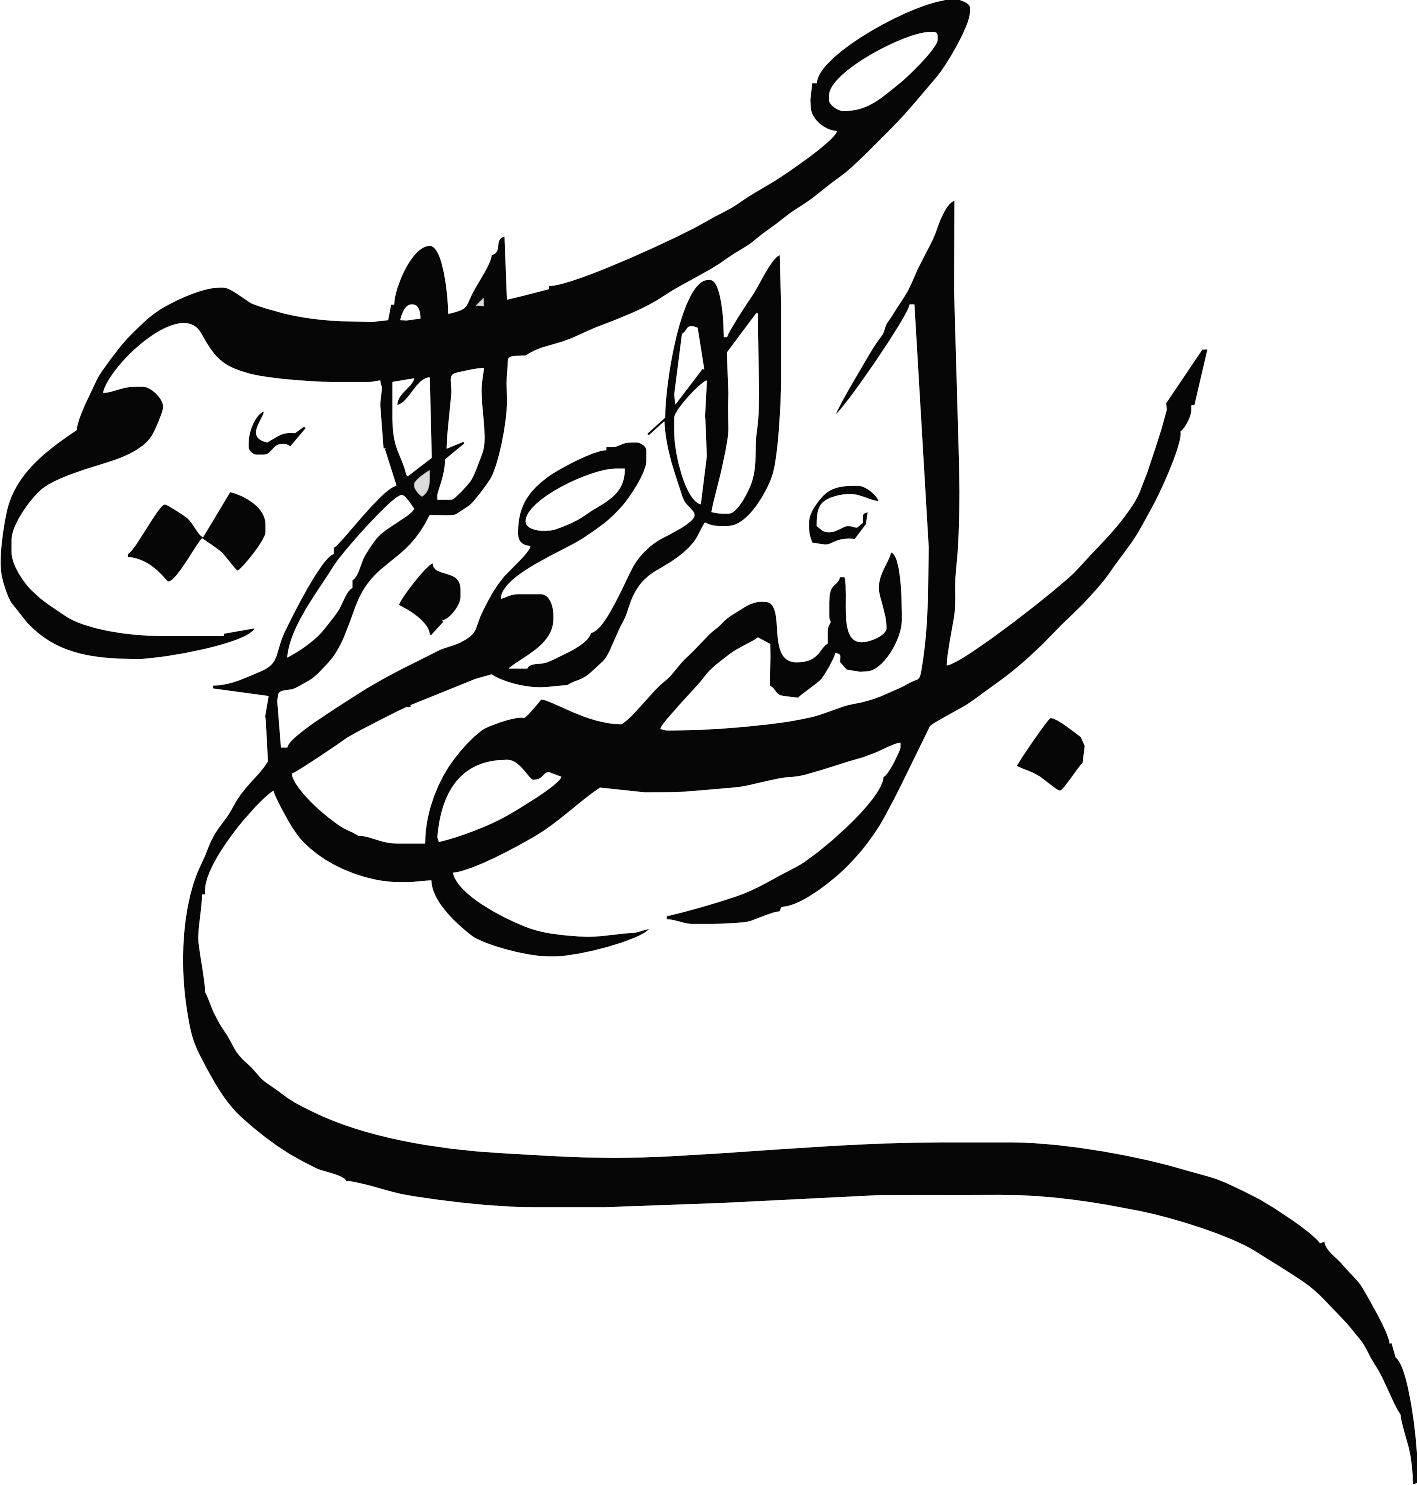 قالب های زیبای بسم الله الرحمن الرحیم